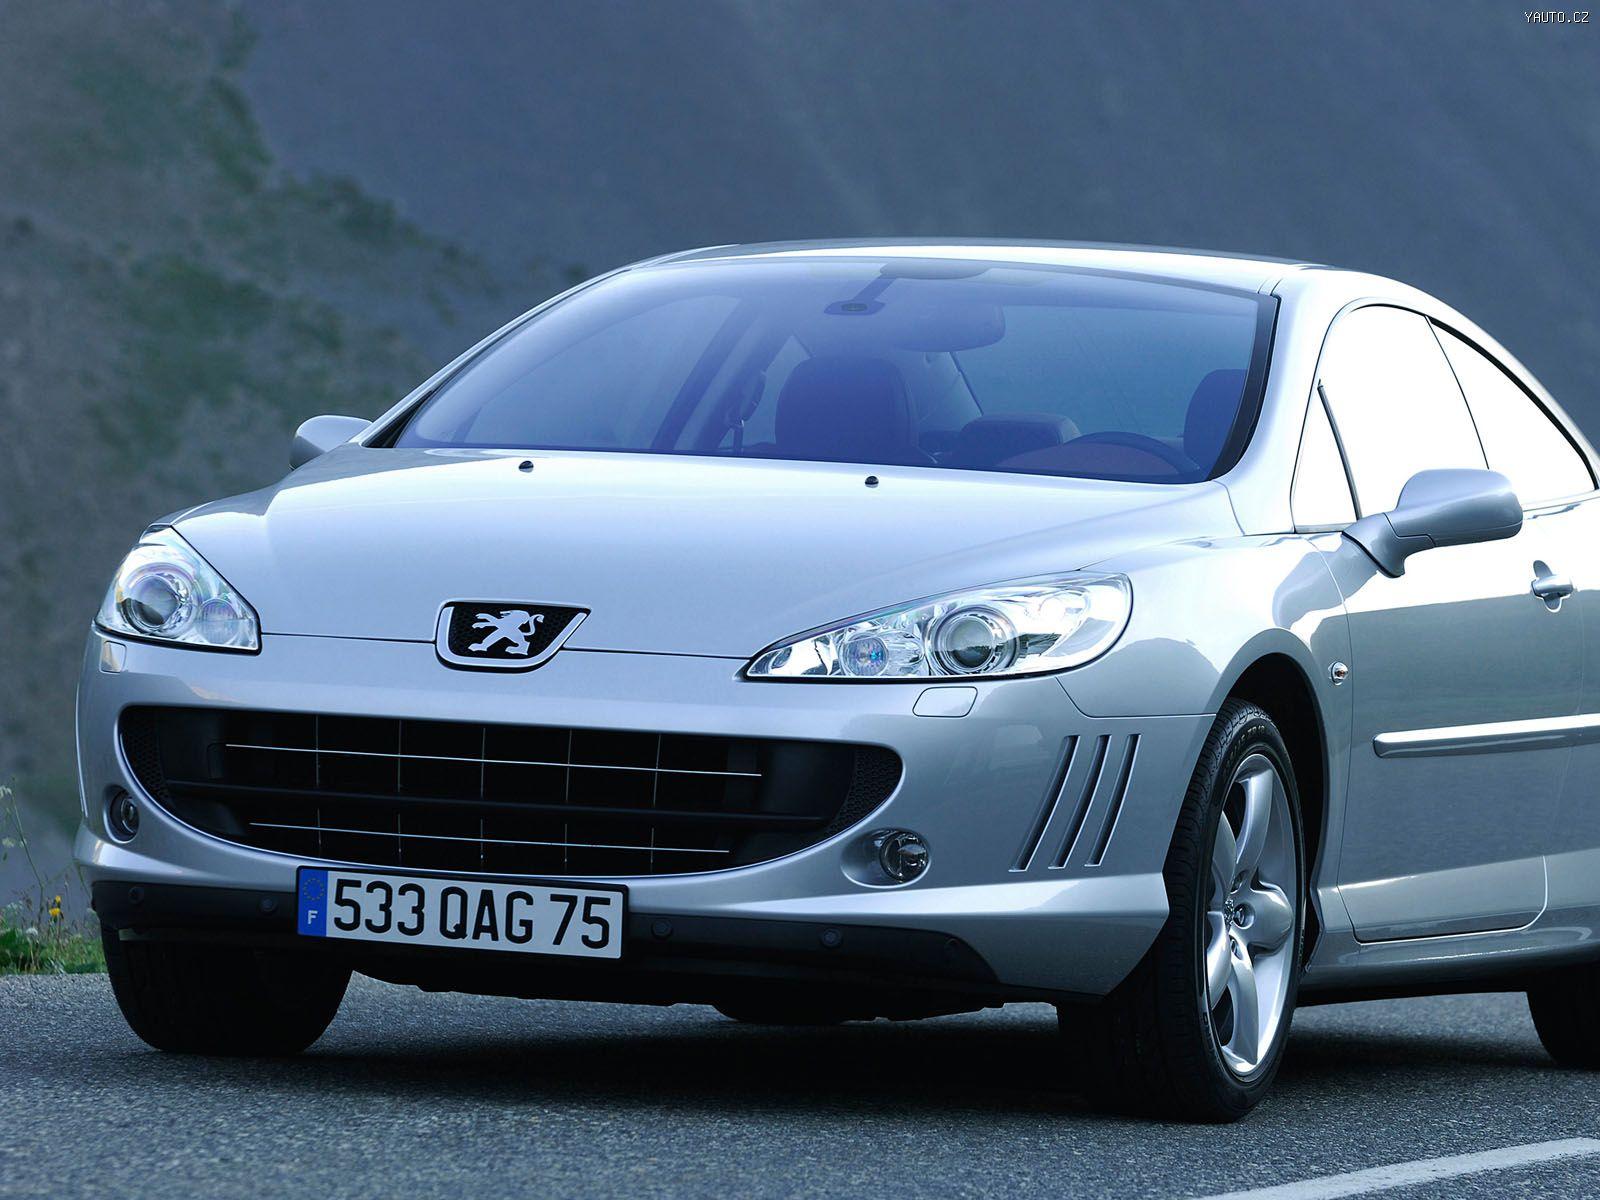 Peugeot 407 2.2 Tendance